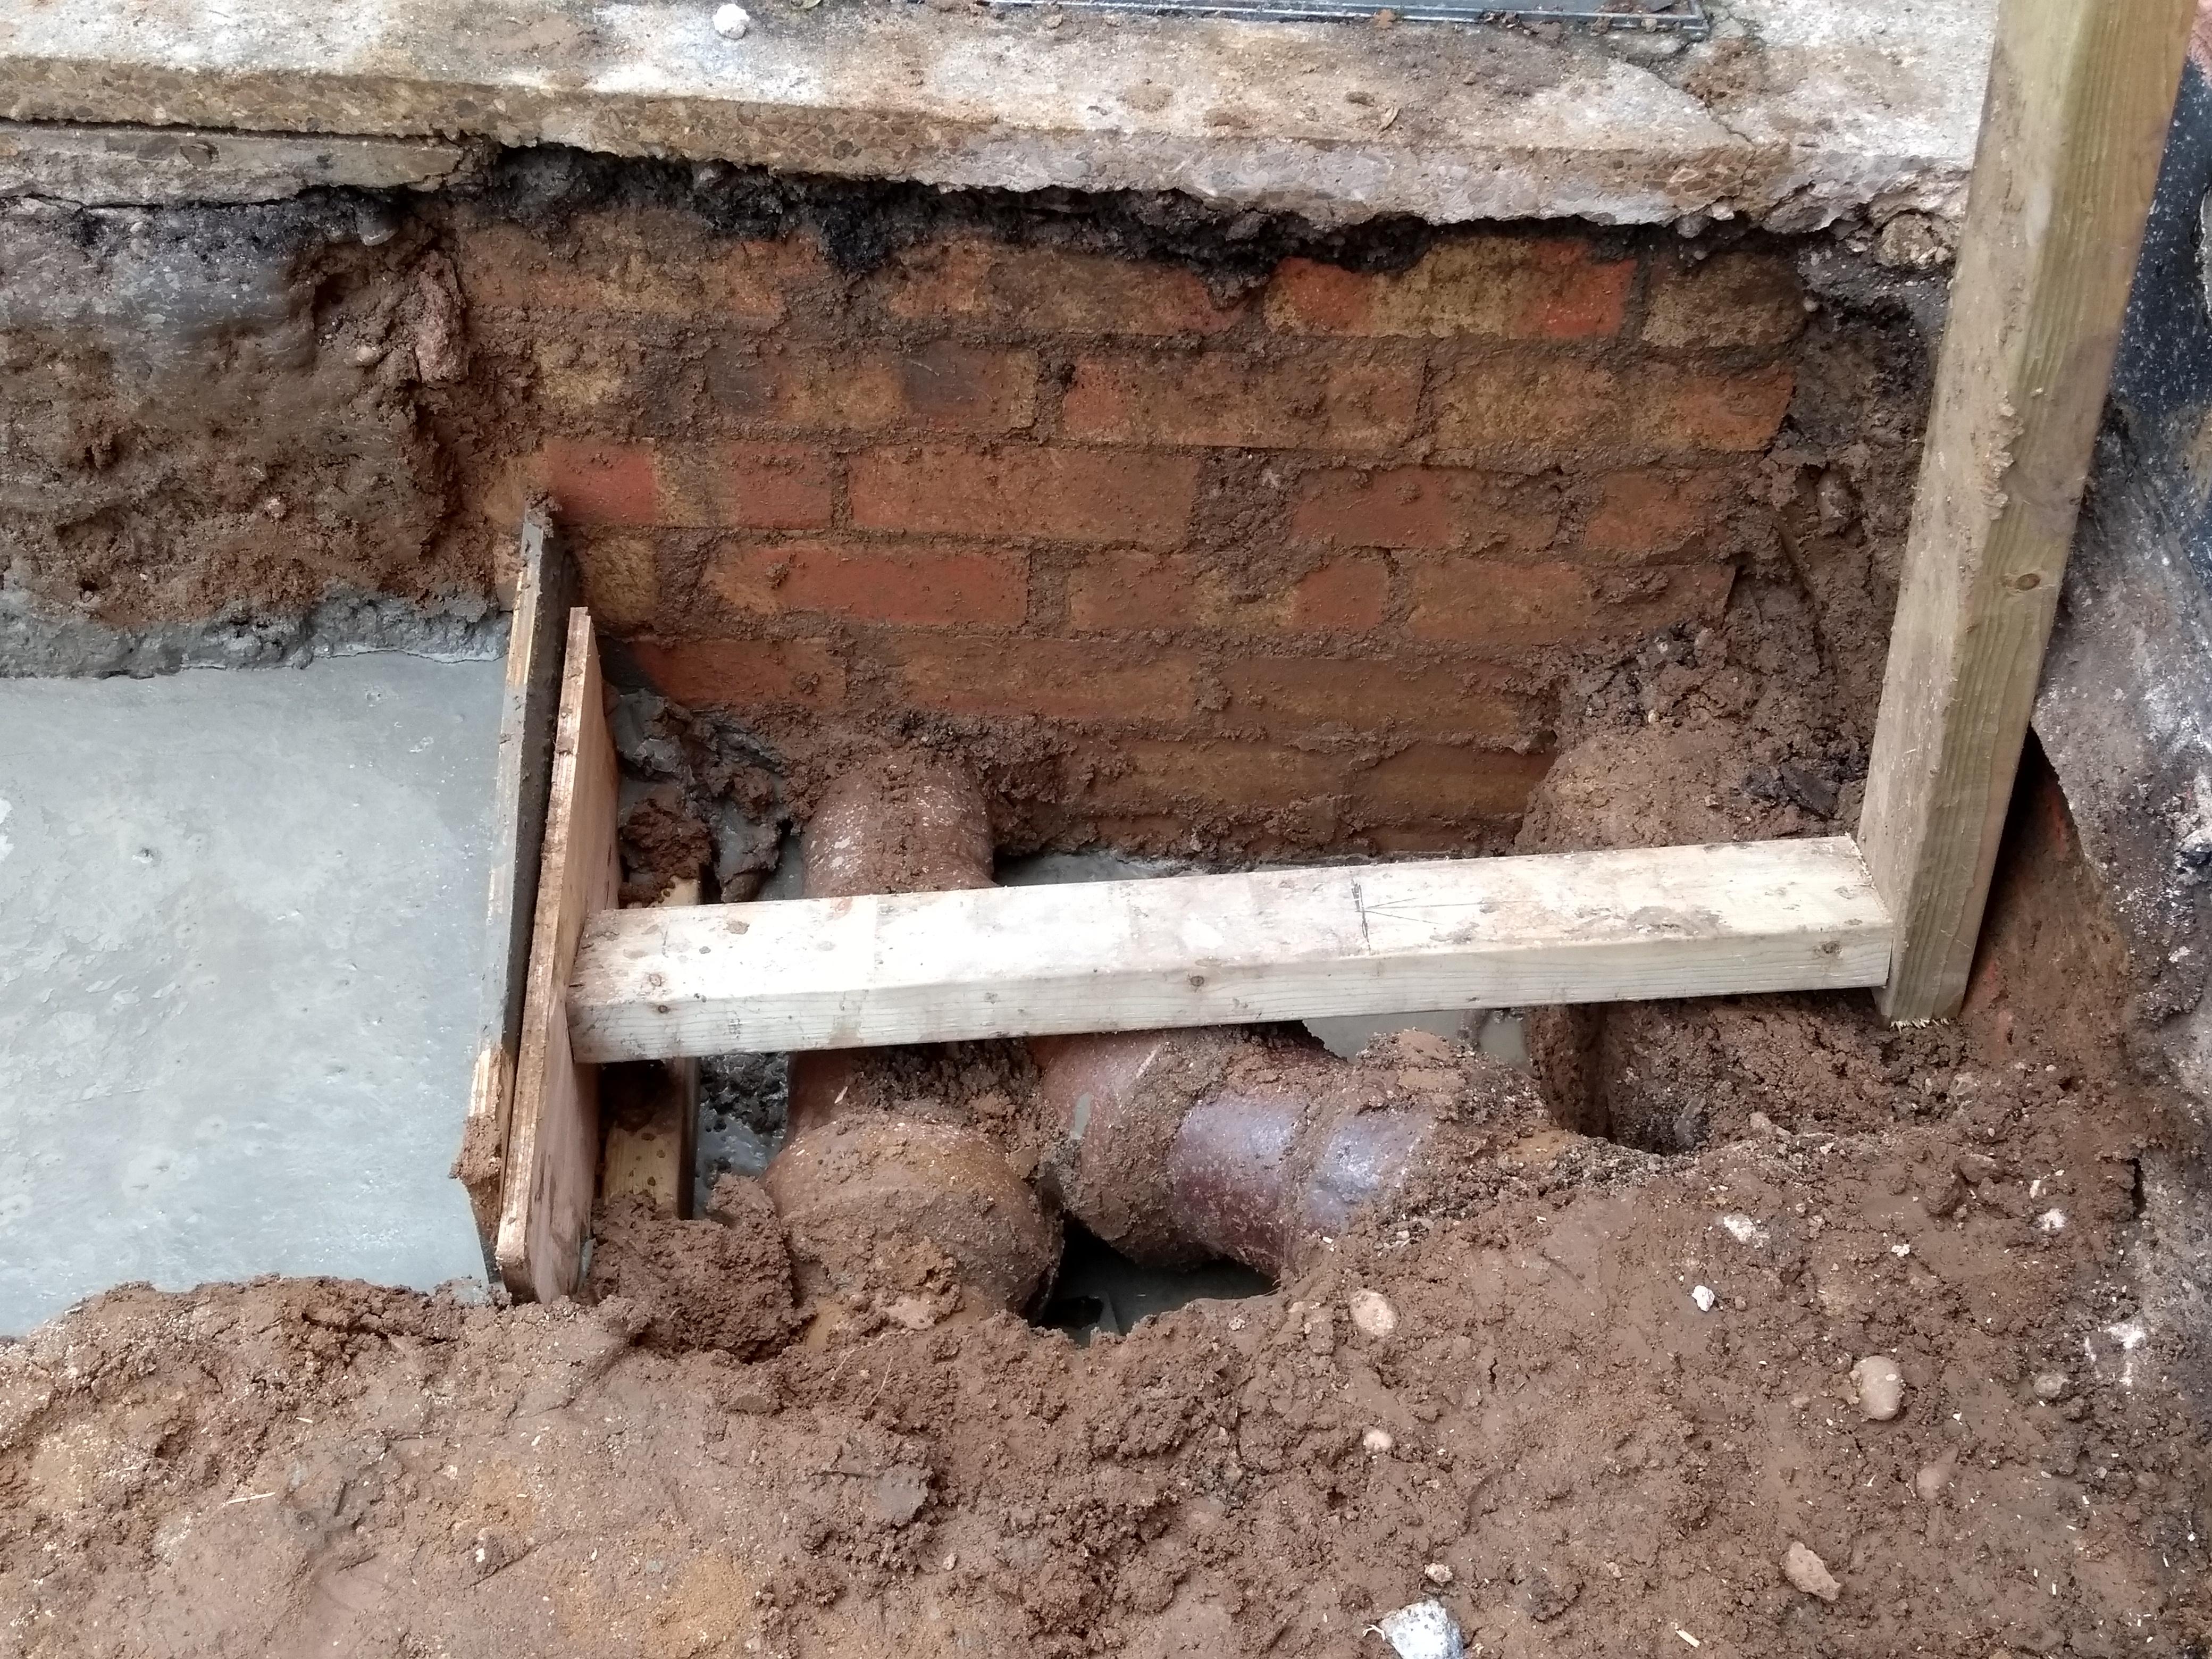 concrete poured around drainage pipes